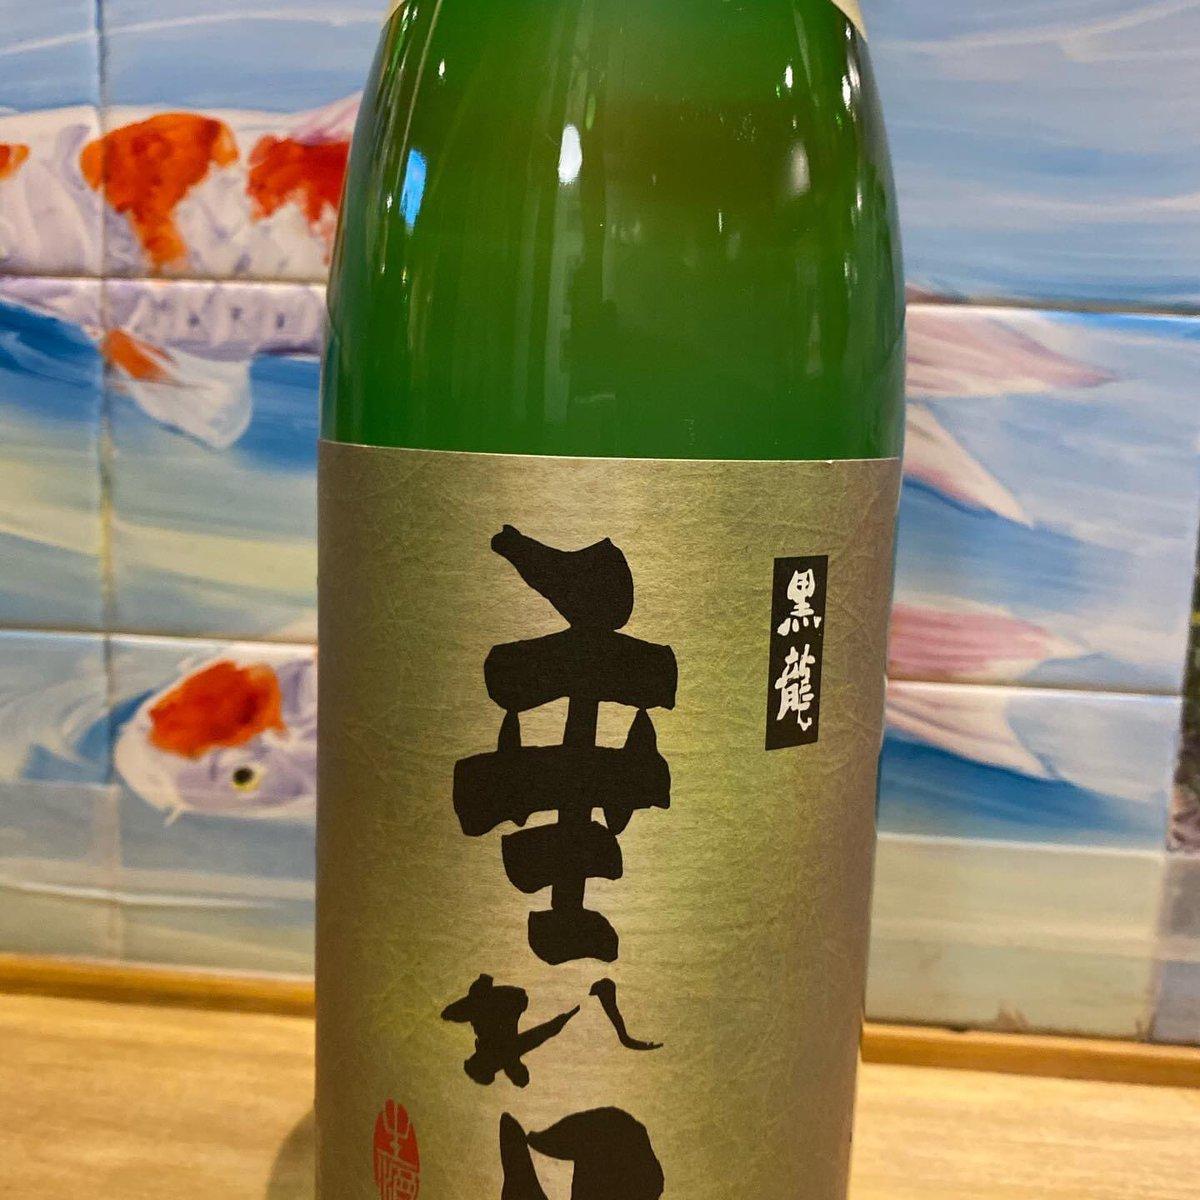 test ツイッターメディア - お疲れ様です。マオフです。 仕入れた日本酒のご紹介です。 黒龍 垂れ口 本醸造生原酒(福井) うっすらと濁る濃厚さを本醸造という作りでキレを演出。スッキリさと濃厚さを楽しめる食事にも合わせやすいです。 本日も和酒マオフ開店です!  #0時からの和酒マオフ #お酒とおつまみ #秋田の日本酒 https://t.co/rgHxjktfNo